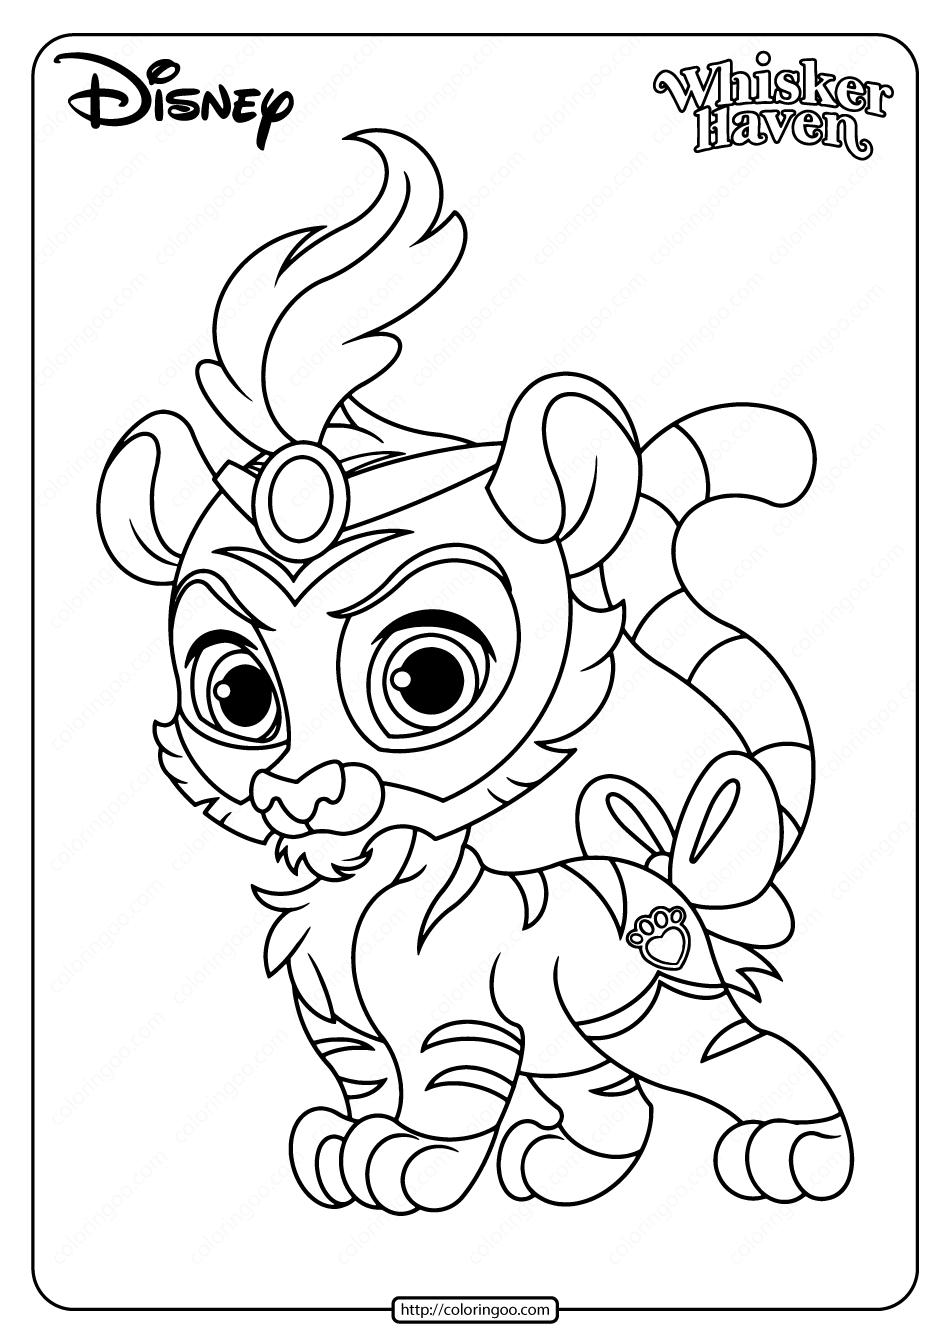 Printable Palace Pets Sultan Pdf Coloring Page In 2020 Princess Coloring Pages Animal Coloring Pages Disney Princess Colors